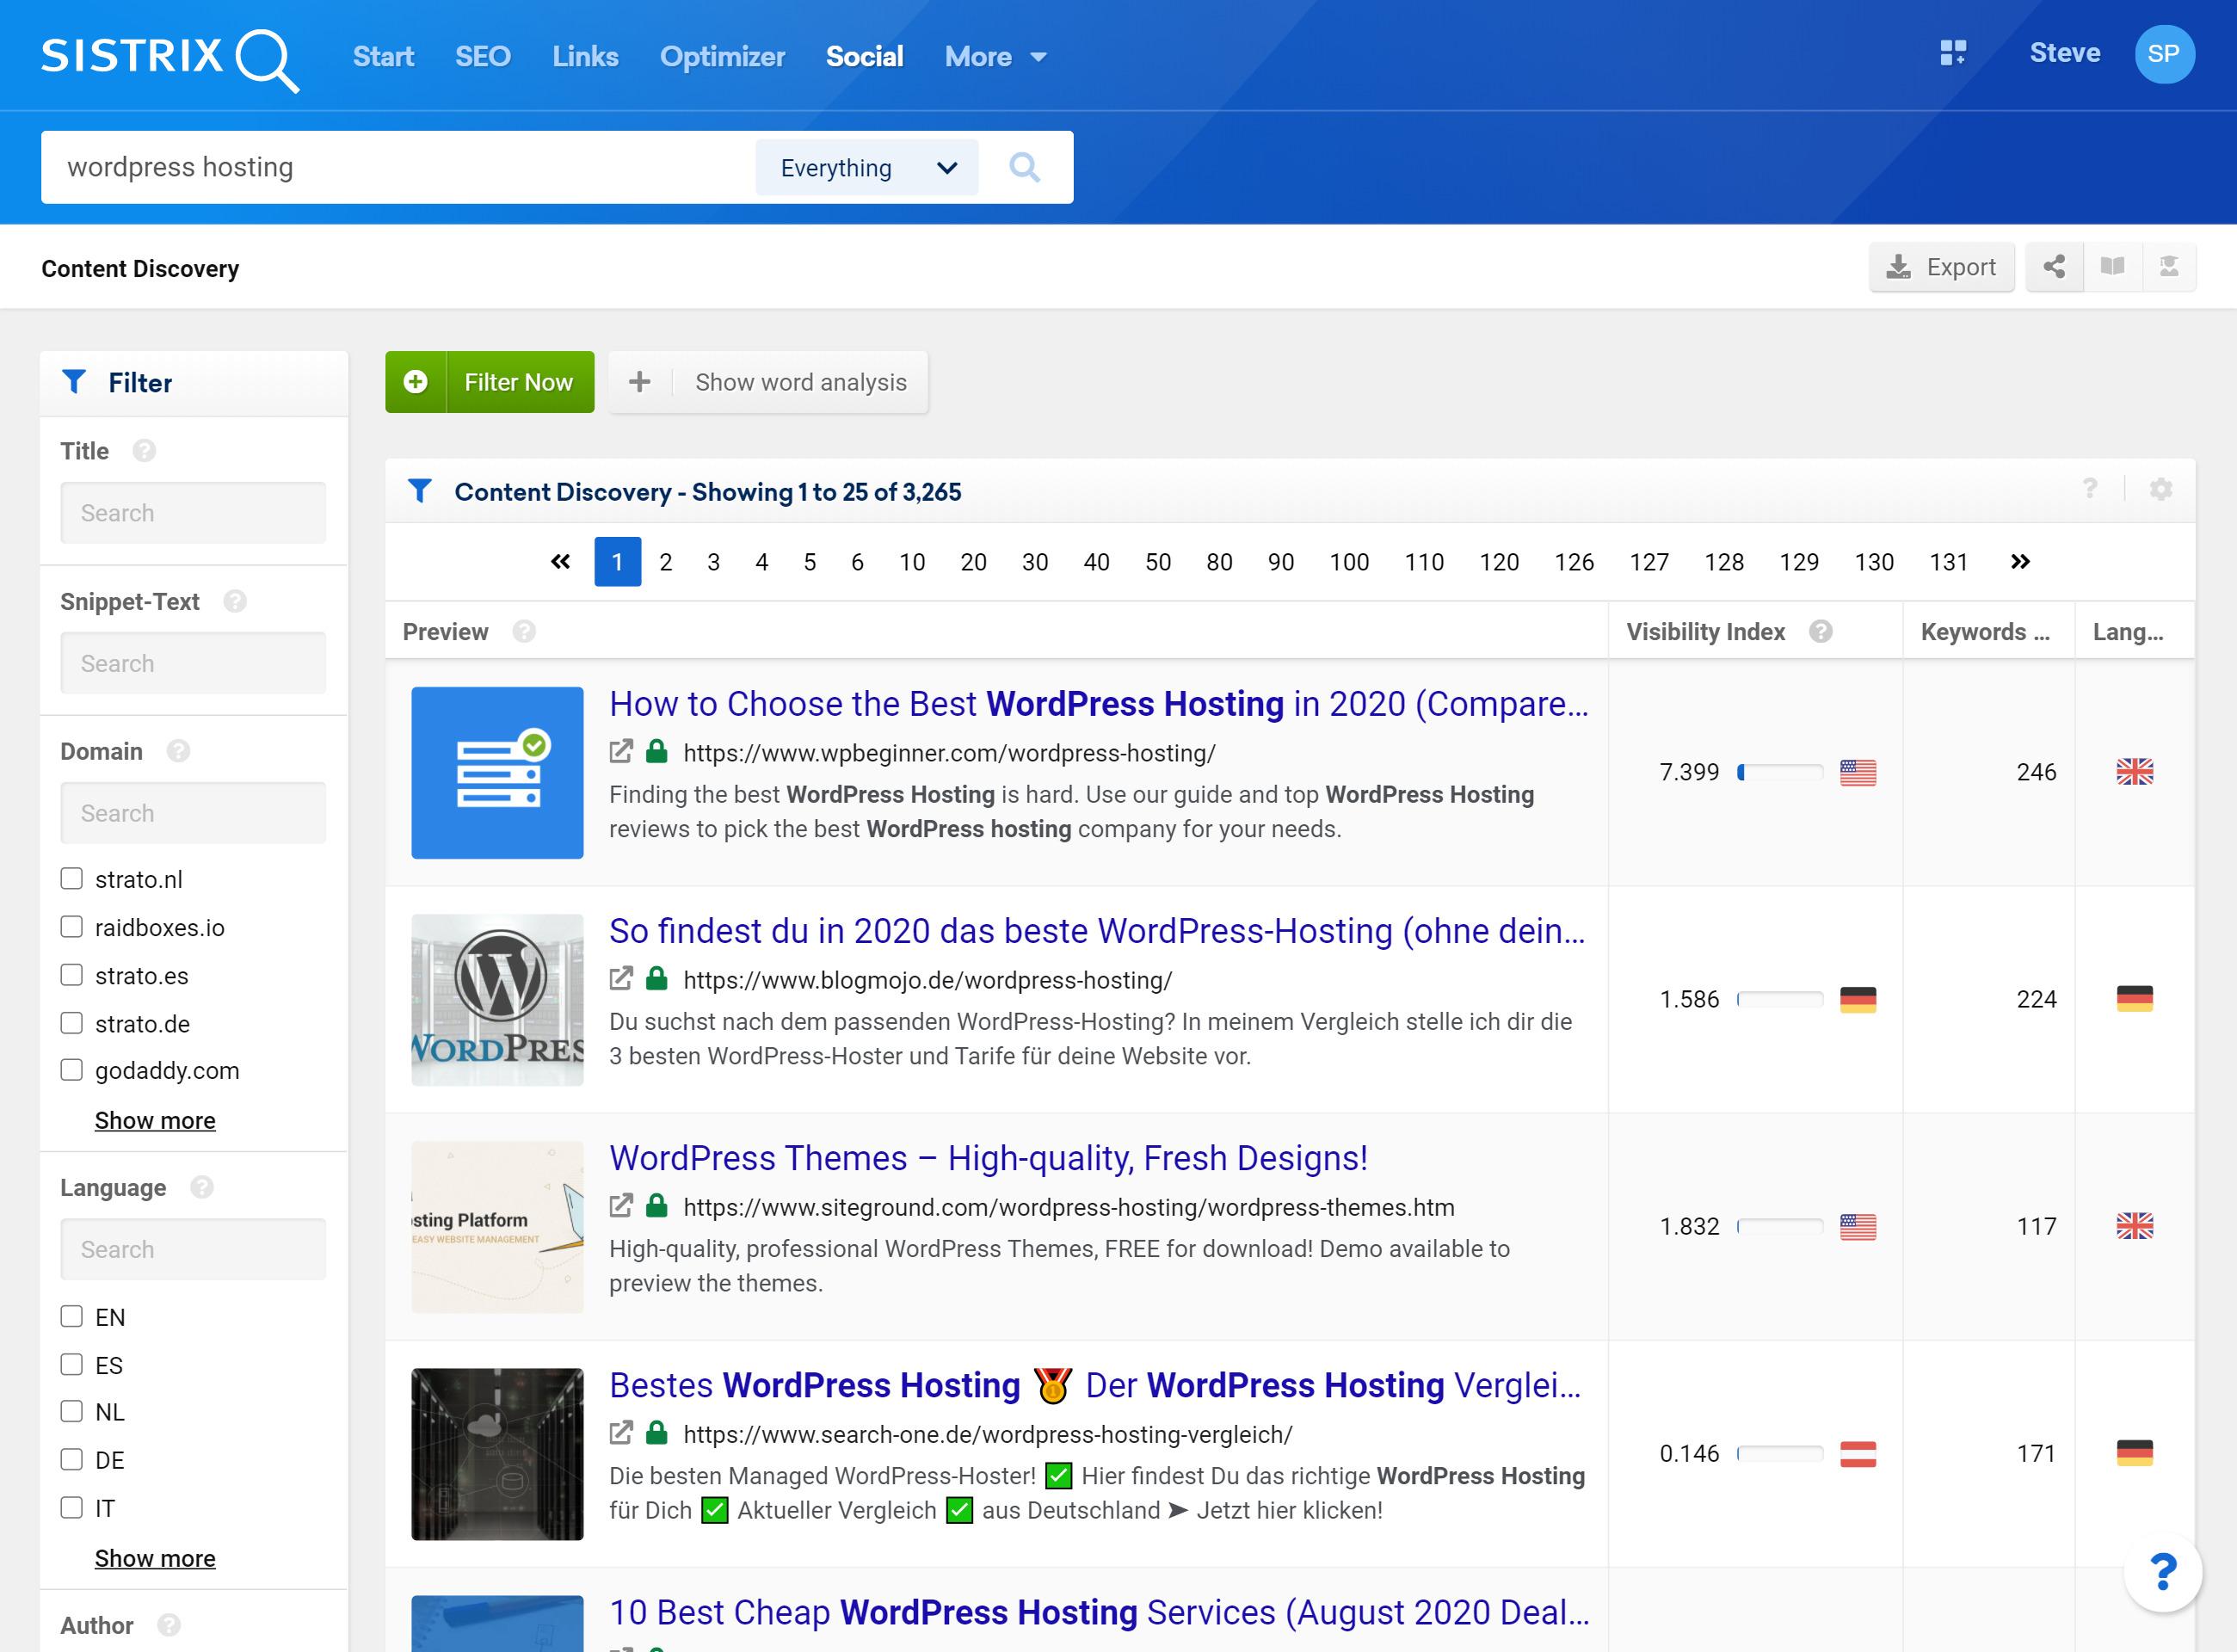 SISTRIX content discovery